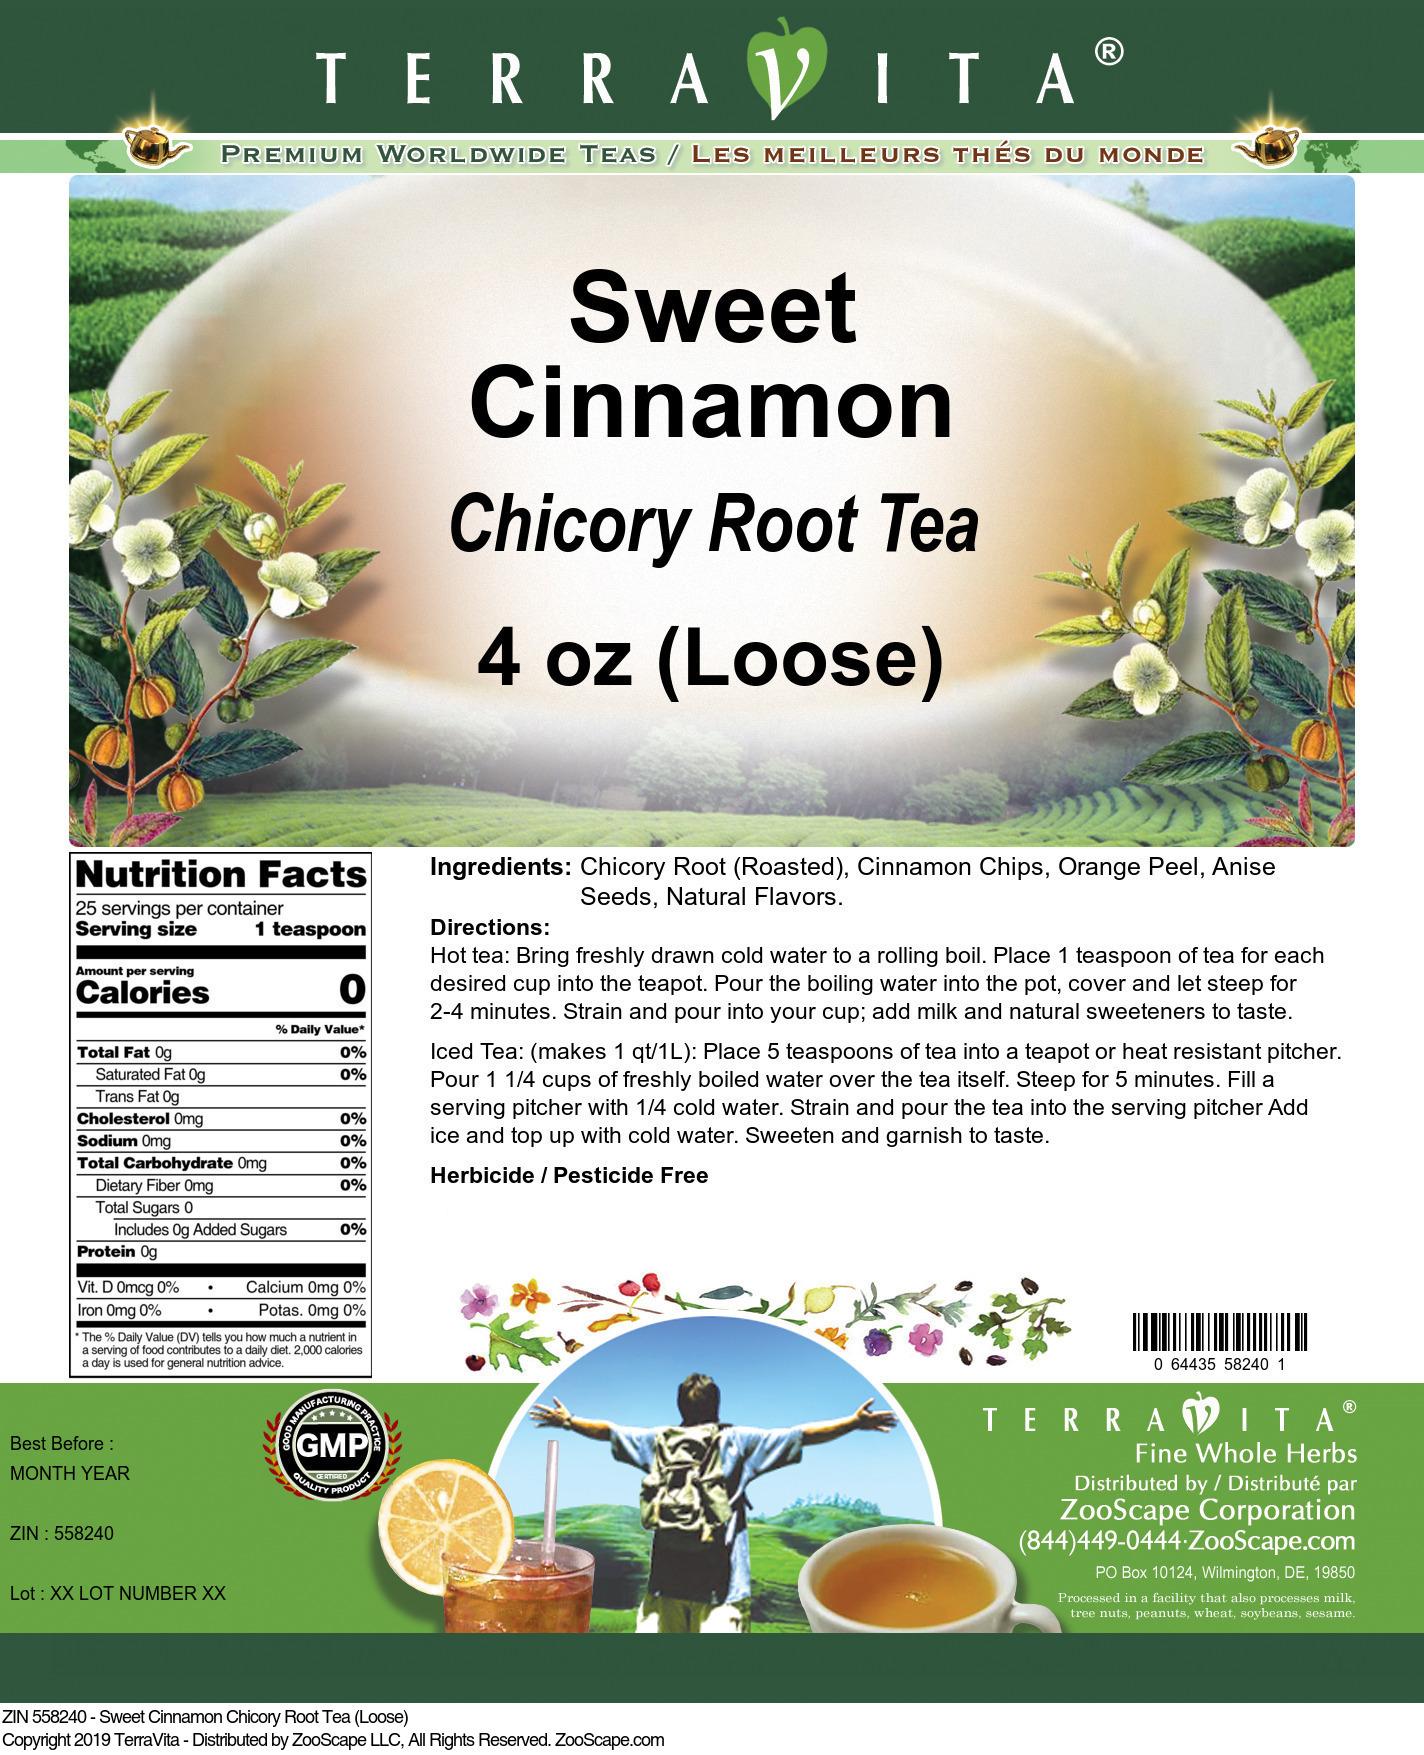 Sweet Cinnamon Chicory Root